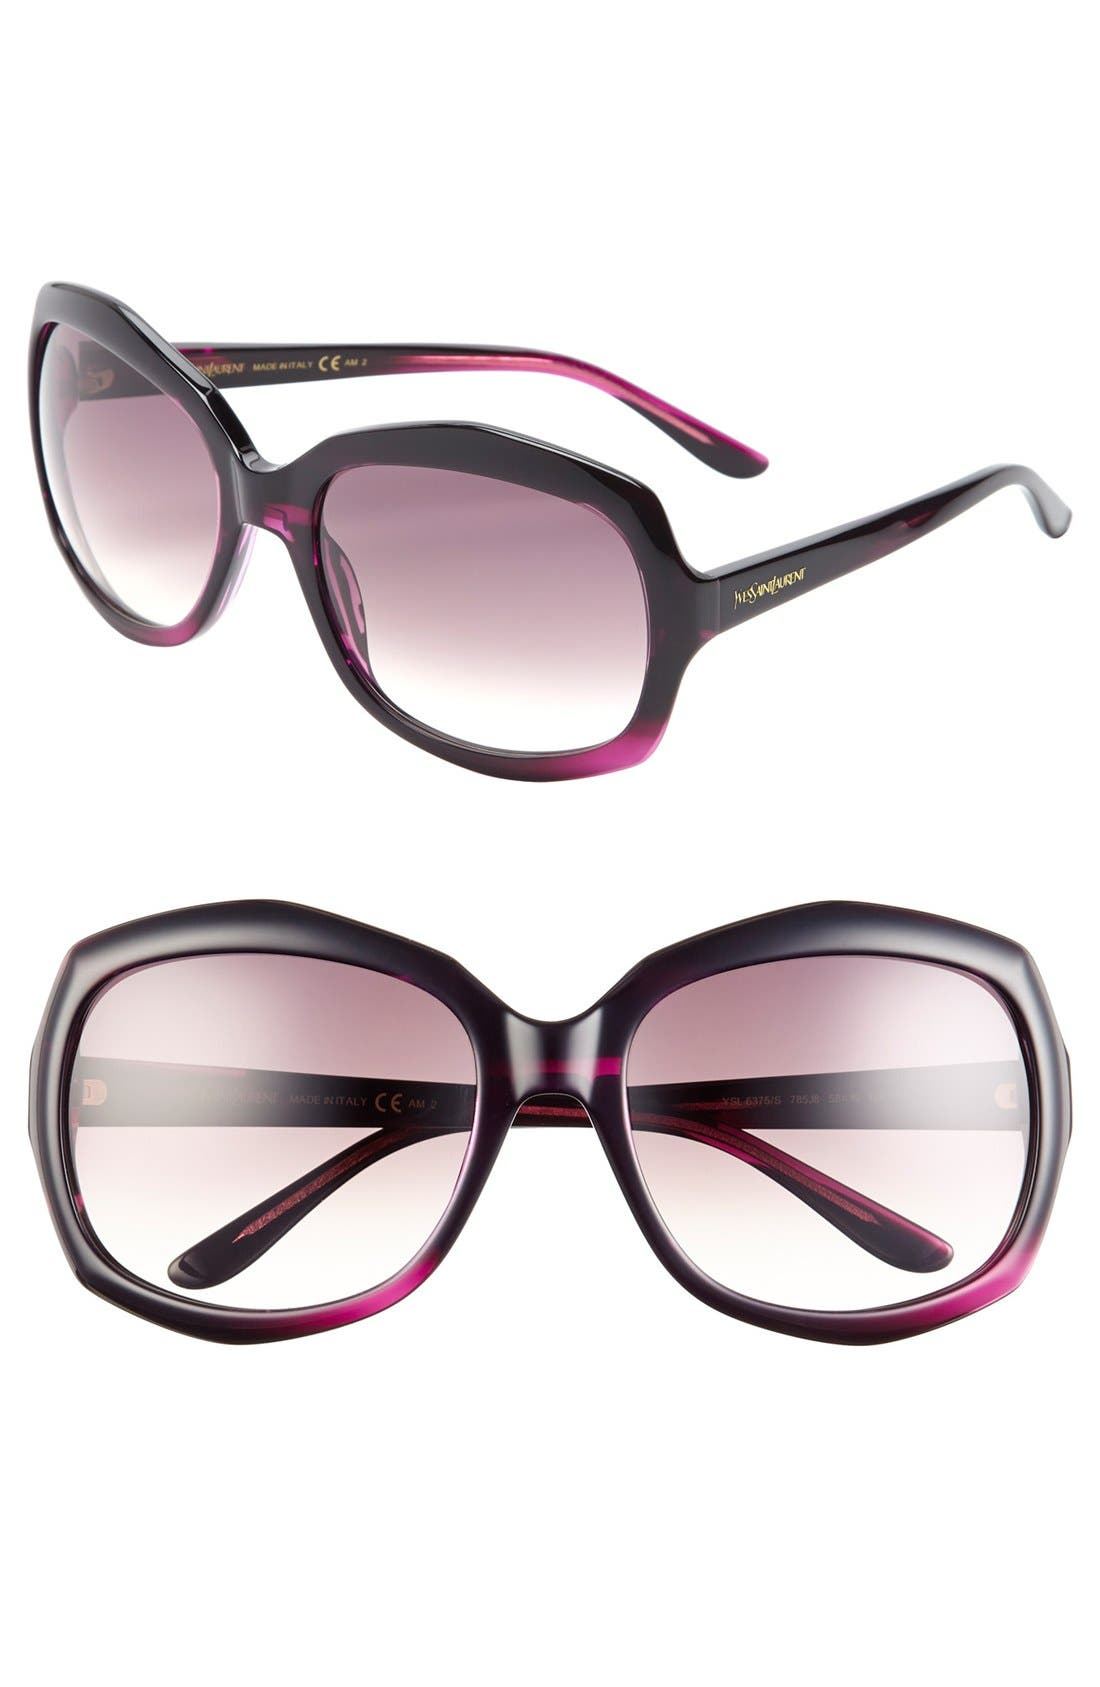 Main Image - Saint Laurent 58mm Oversized Sunglasses